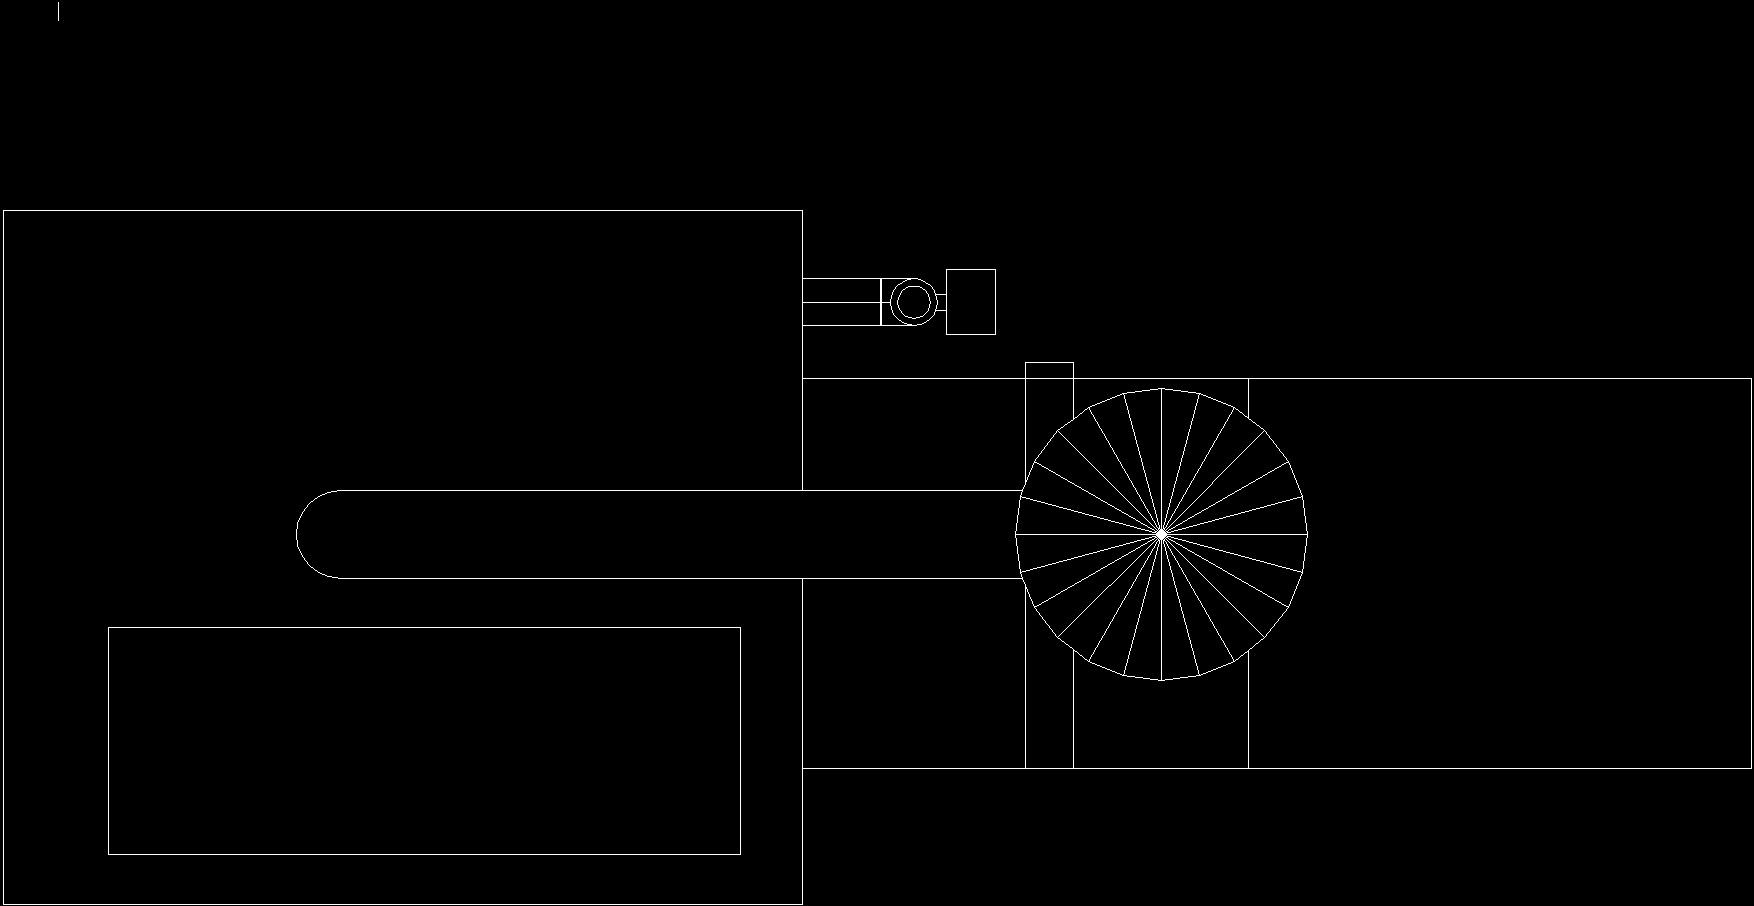 Air Conditioner Dwg Block For Autocad Designs Cad